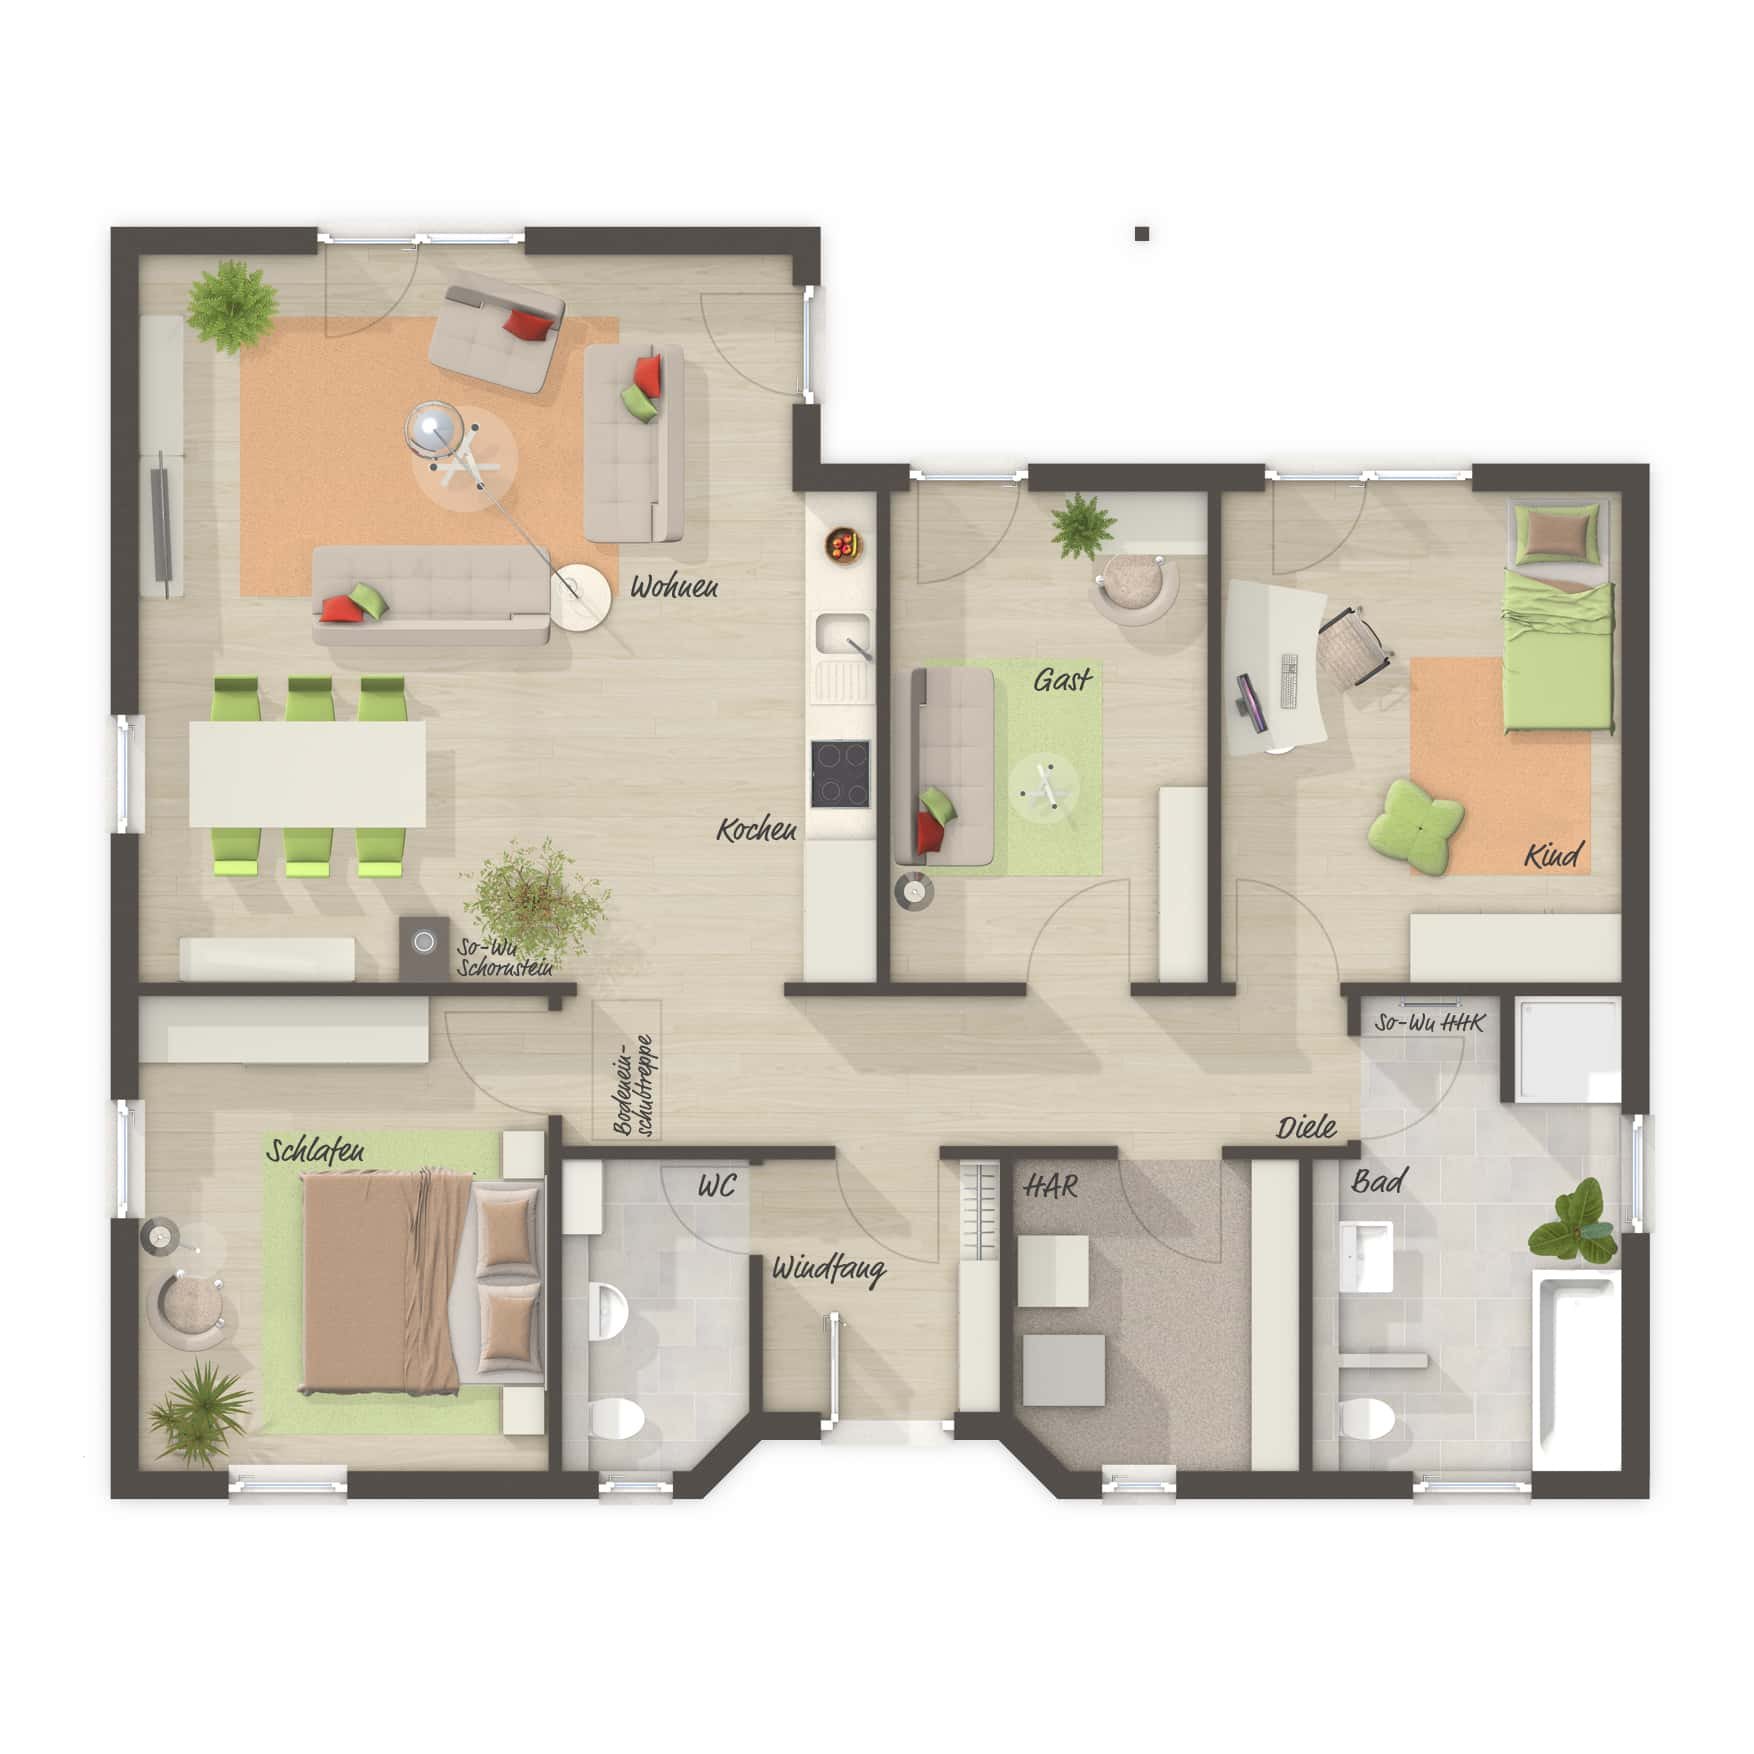 Grundriss Bungalow ebenerdig, 4 Zimmer, 108 qm, Küche offen - Massivhaus Winkelbungalow 108 Town Country Haus - HausbauDirekt.de